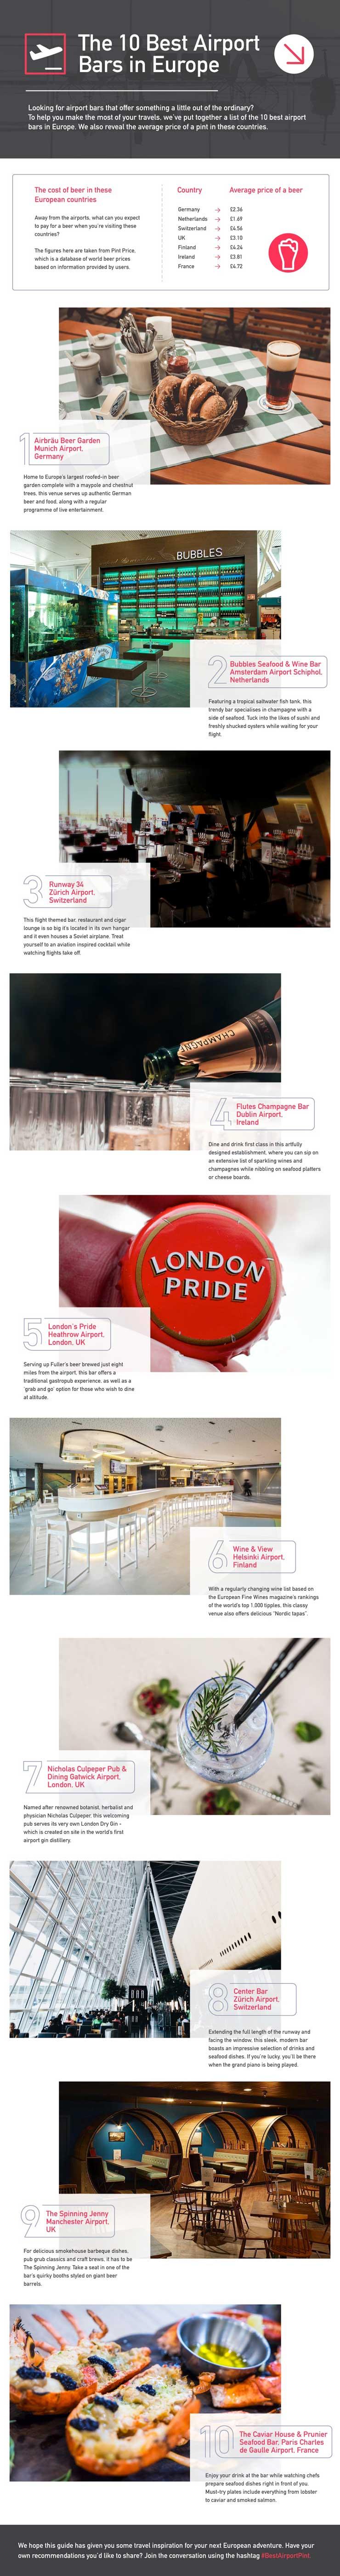 10 best Airport Bars